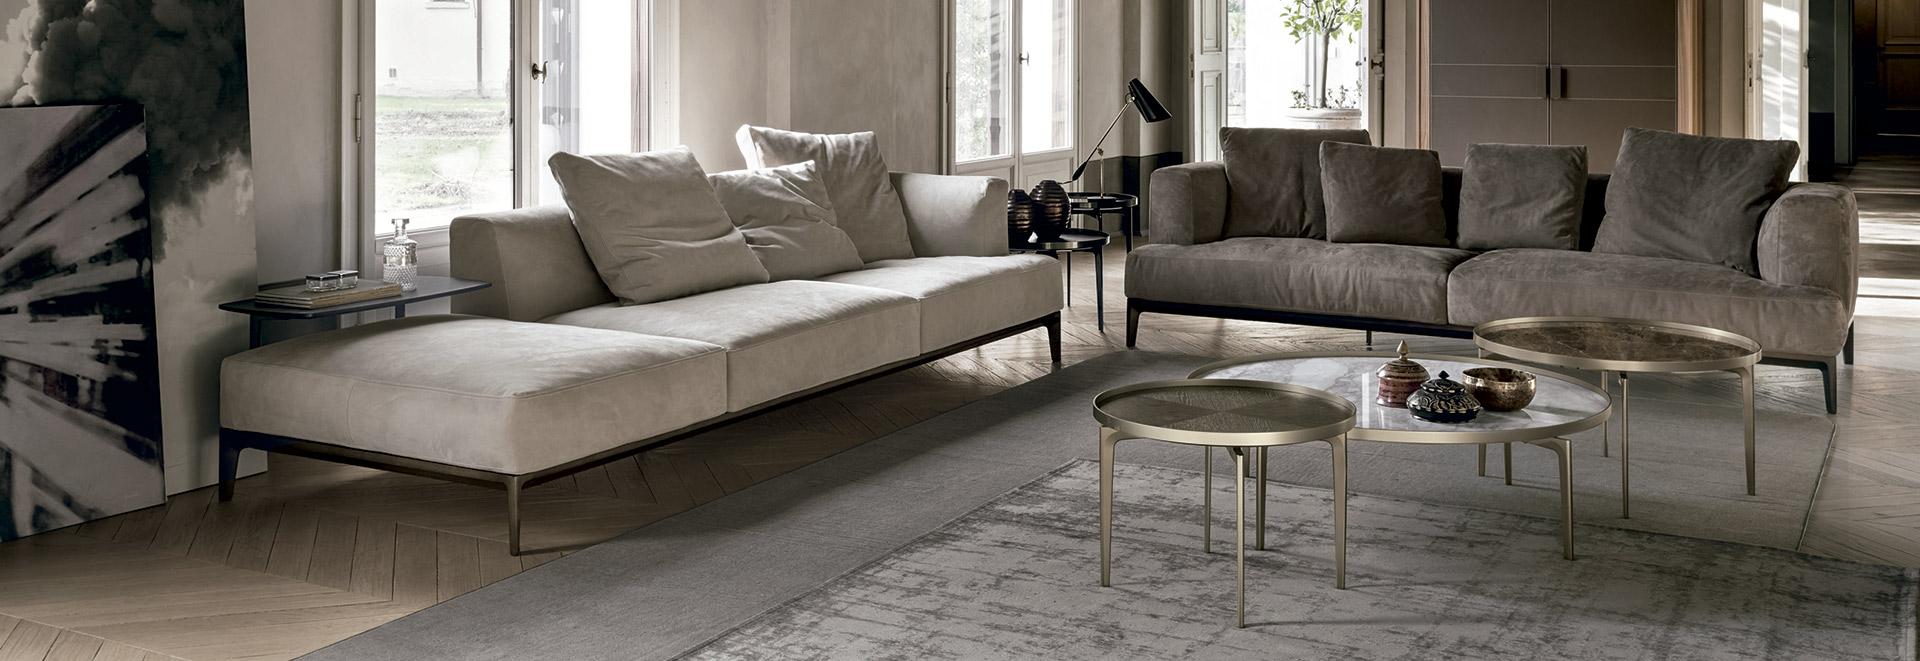 sofa-ambiente.jpg